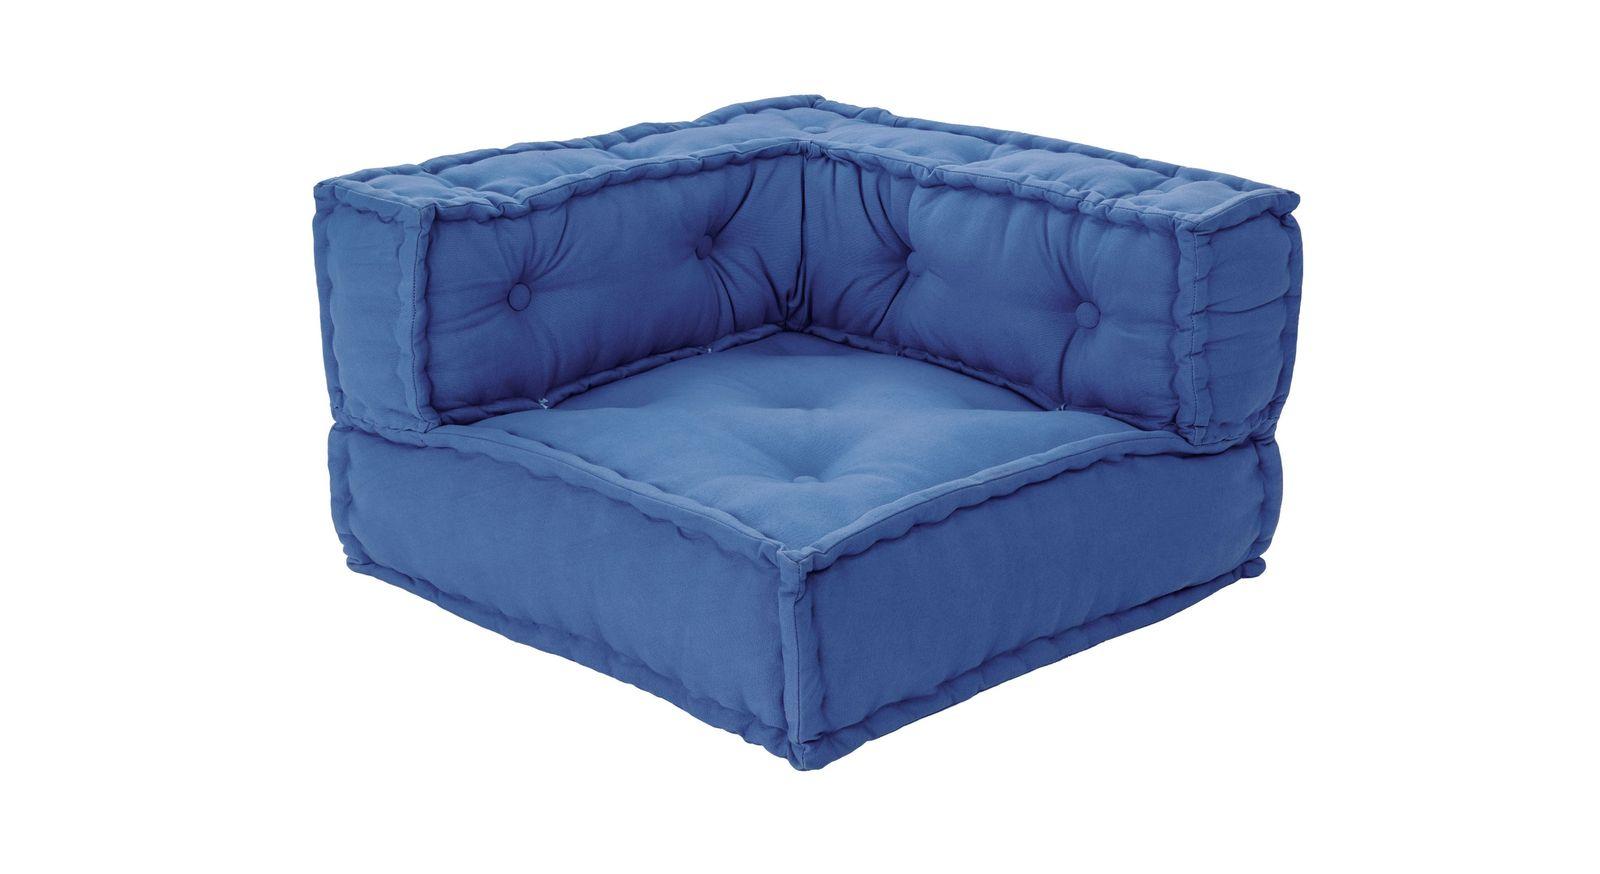 Sitzkissen-Sofa Kids Paradises blaues Ecksitzkissen